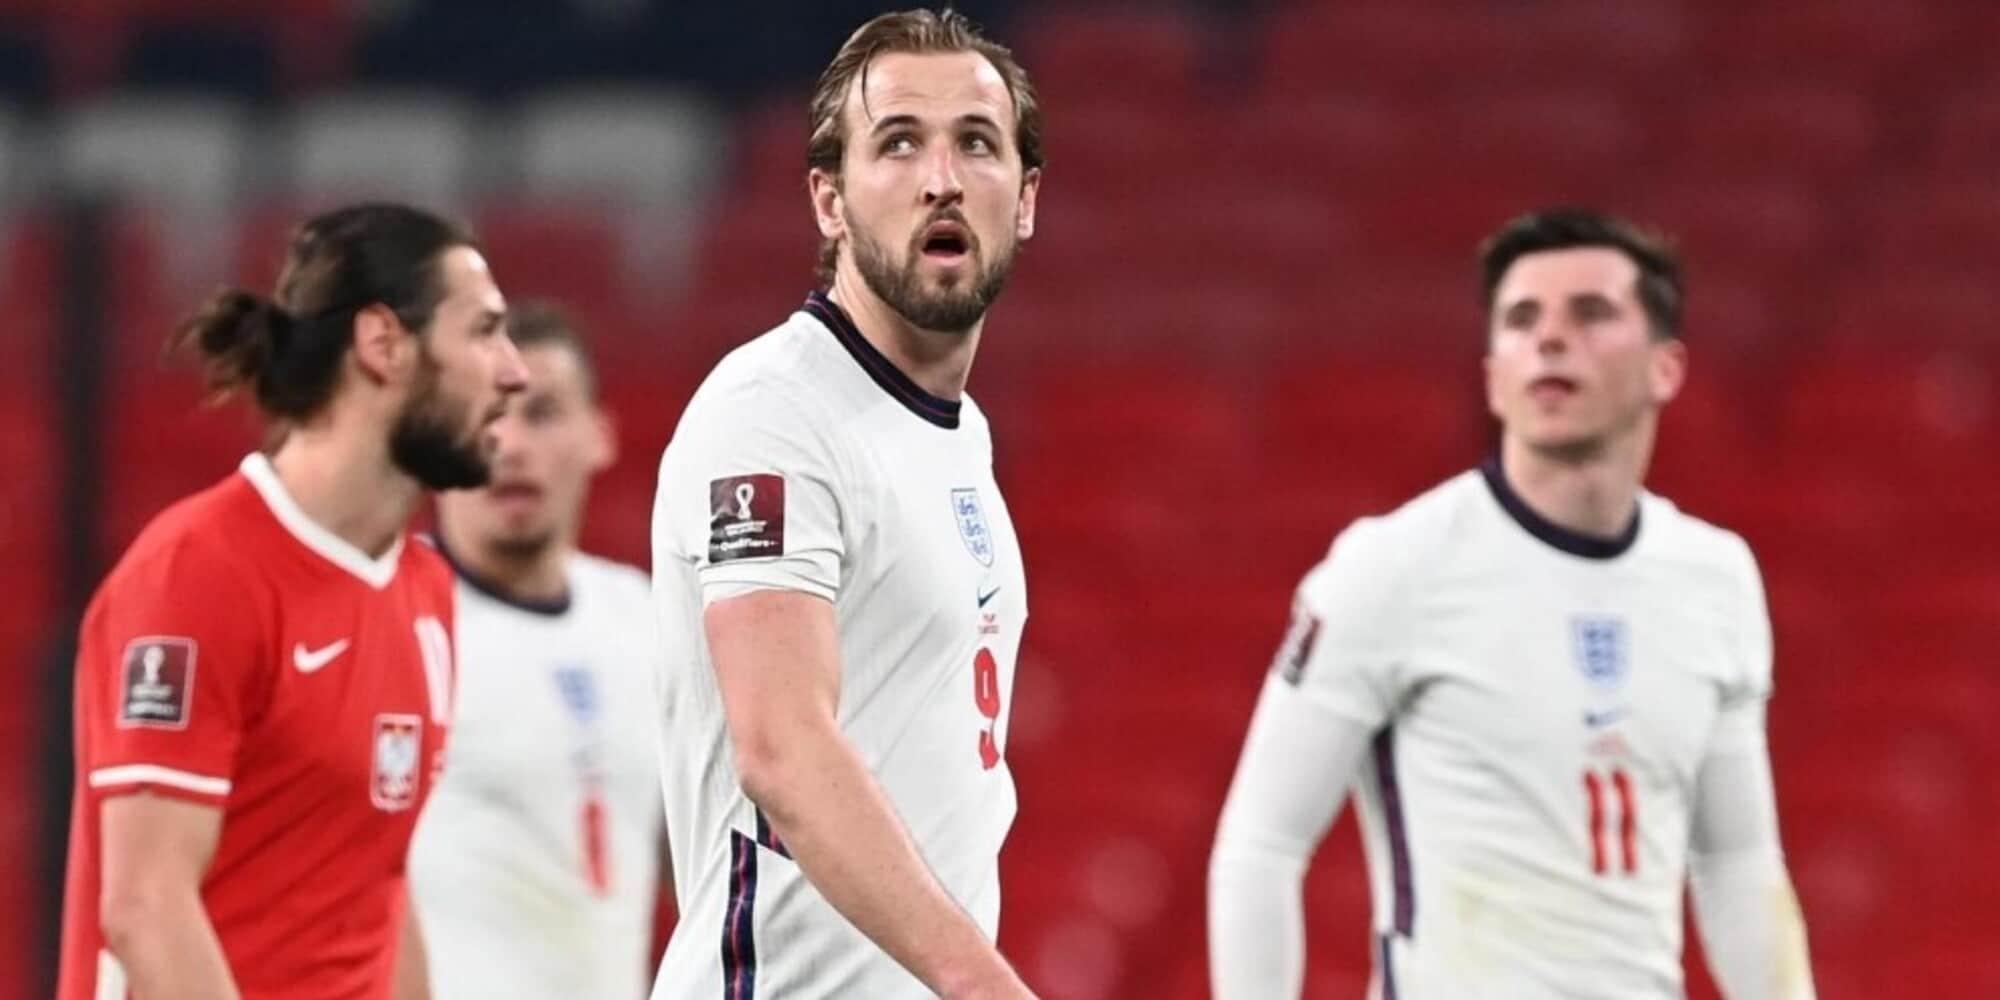 Europei, convocati Inghilterra: Kane è la stella. Per ora c'è Maguire